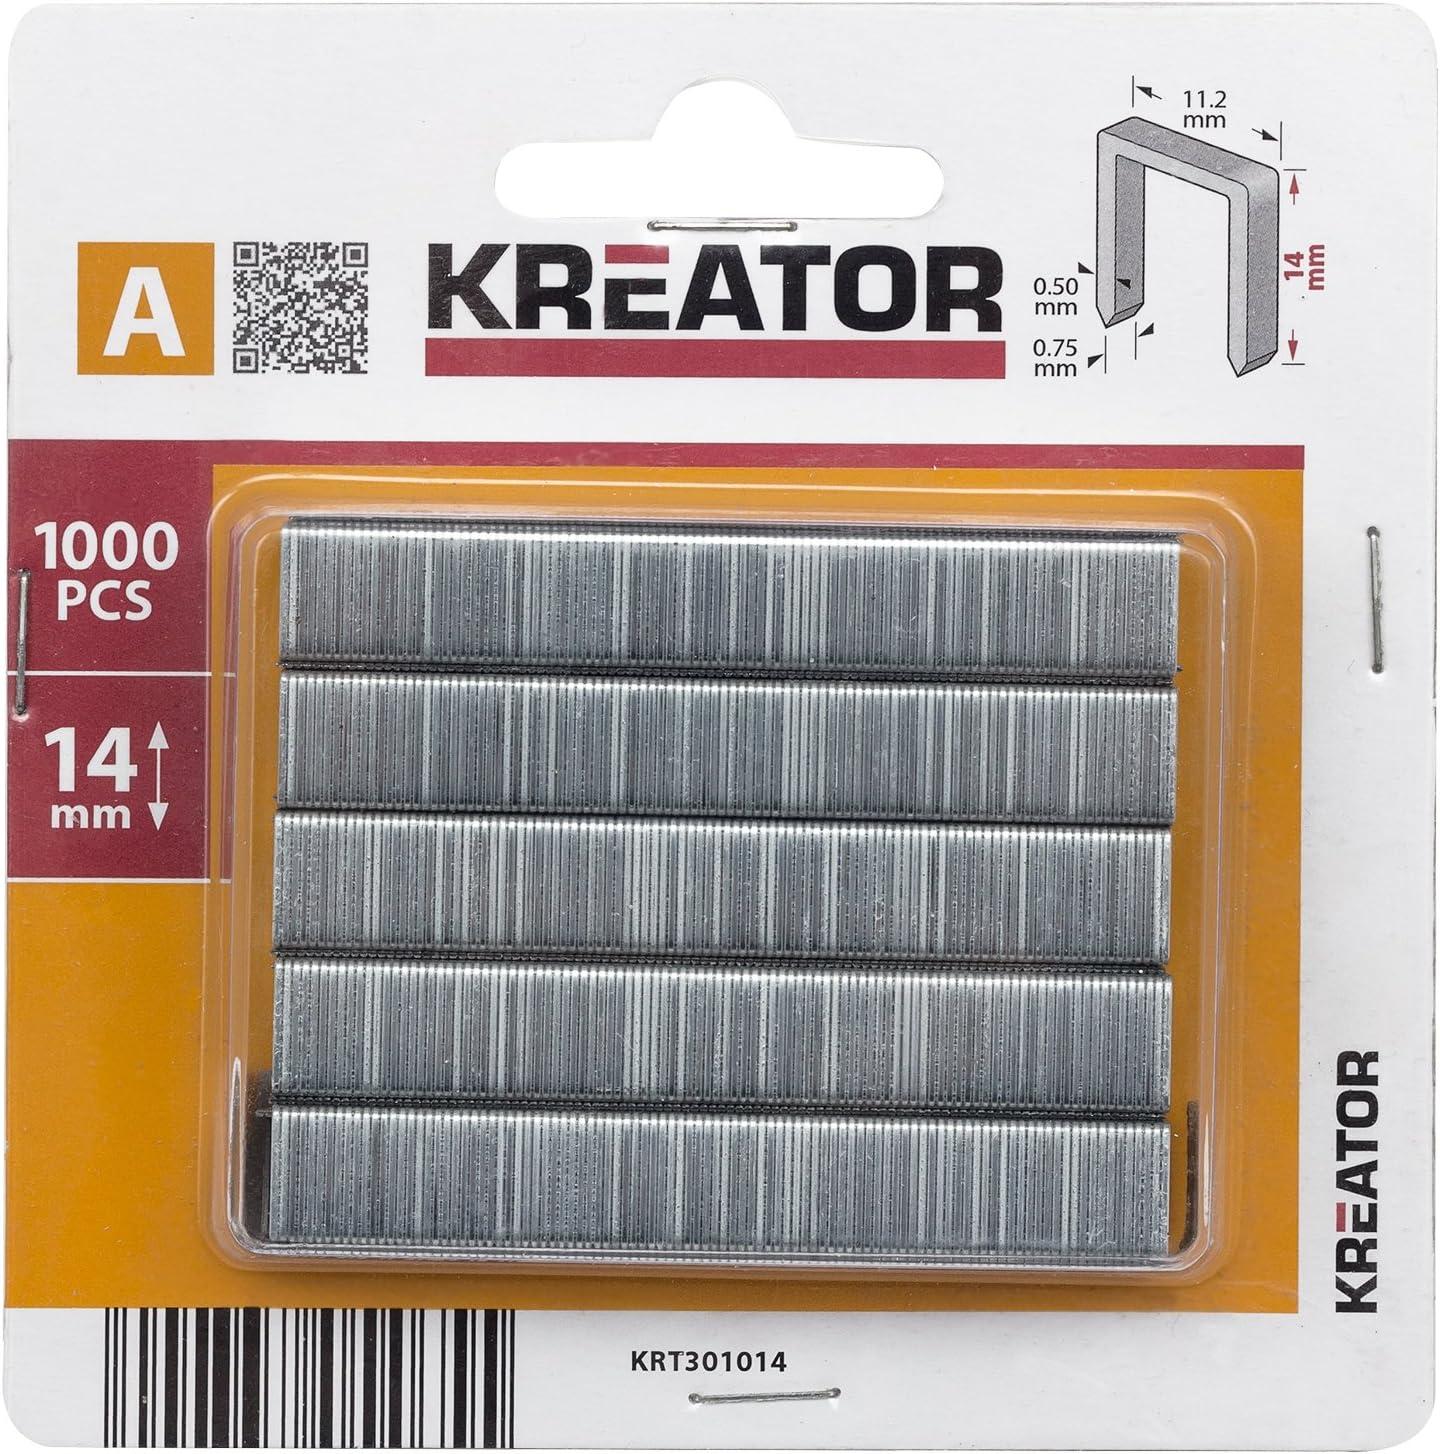 type A 10 mm 1000 st Kreator KRT301010 Nieten